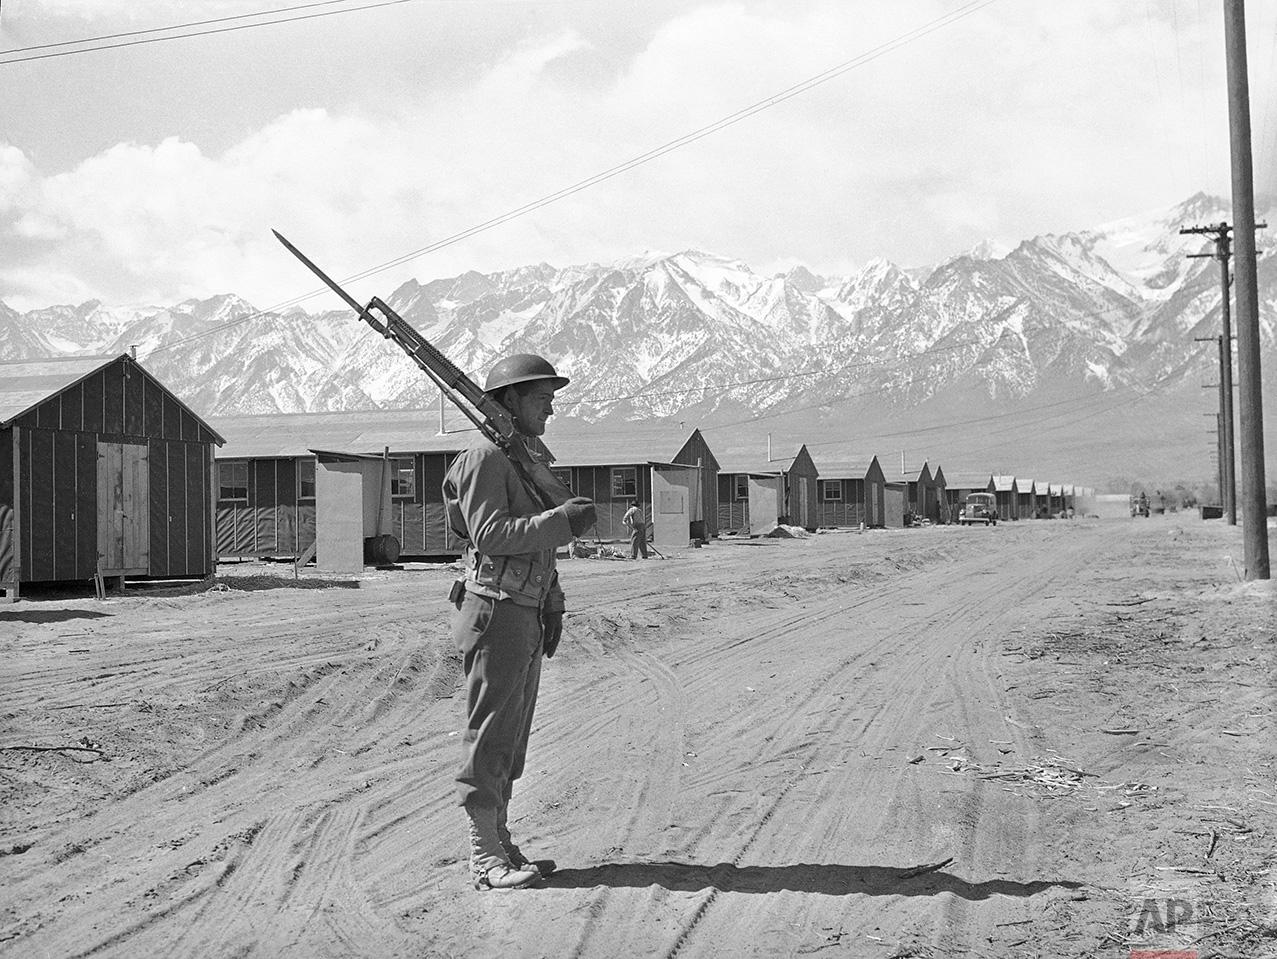 An American soldier guards a Japanese internment camp at Manzanar, Calif., May 23, 1943. (AP Photo)